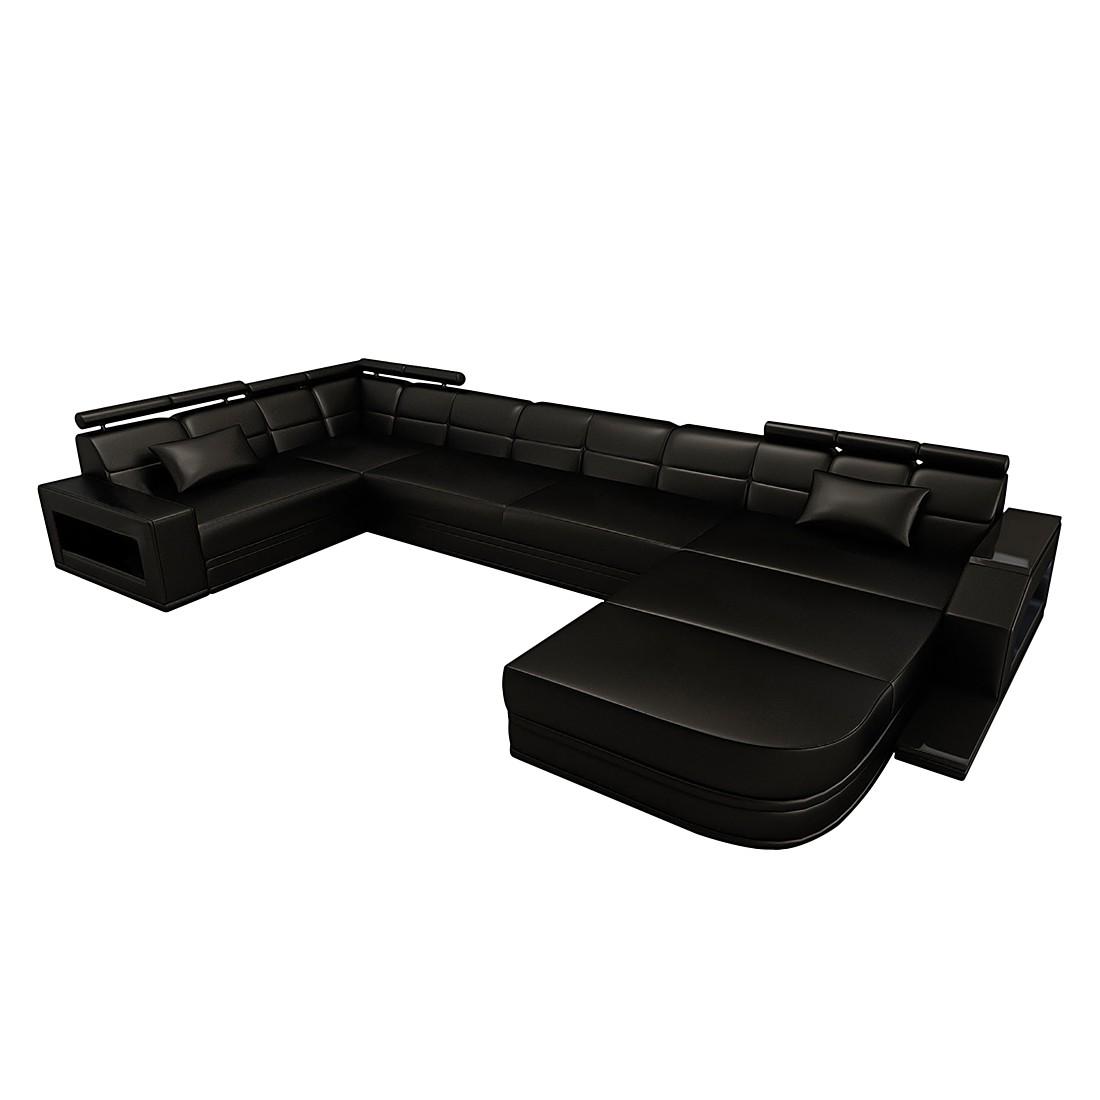 wohnlandschaft venedig echtleder schwarz schwarz ausf hrung ottomane rechts sofa dreams. Black Bedroom Furniture Sets. Home Design Ideas